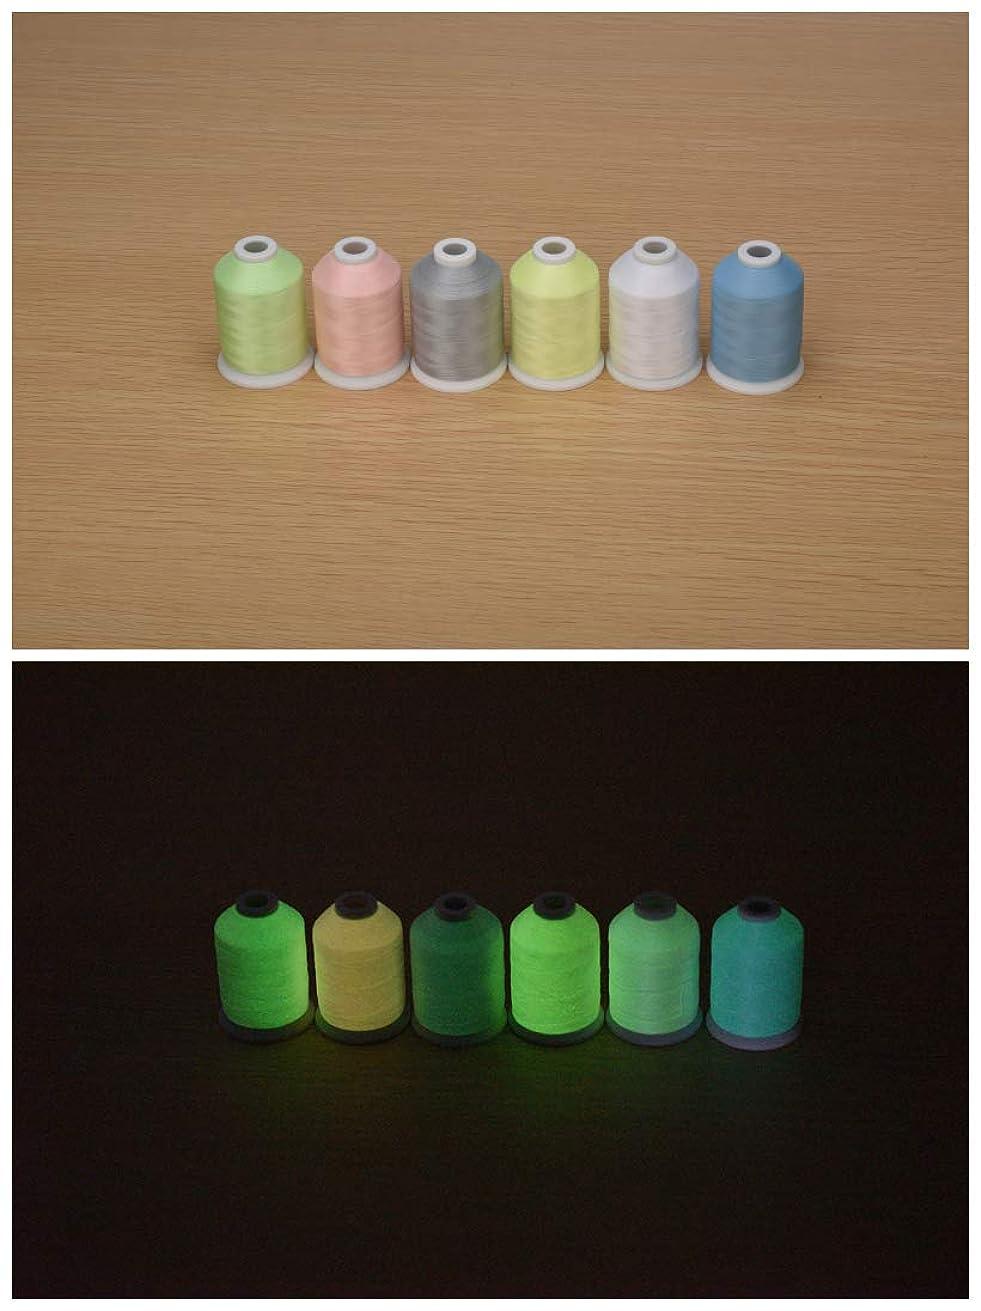 Simthread Embroidery Machine Thread 6 Colors Glow in The Dark Thread (1000Y)